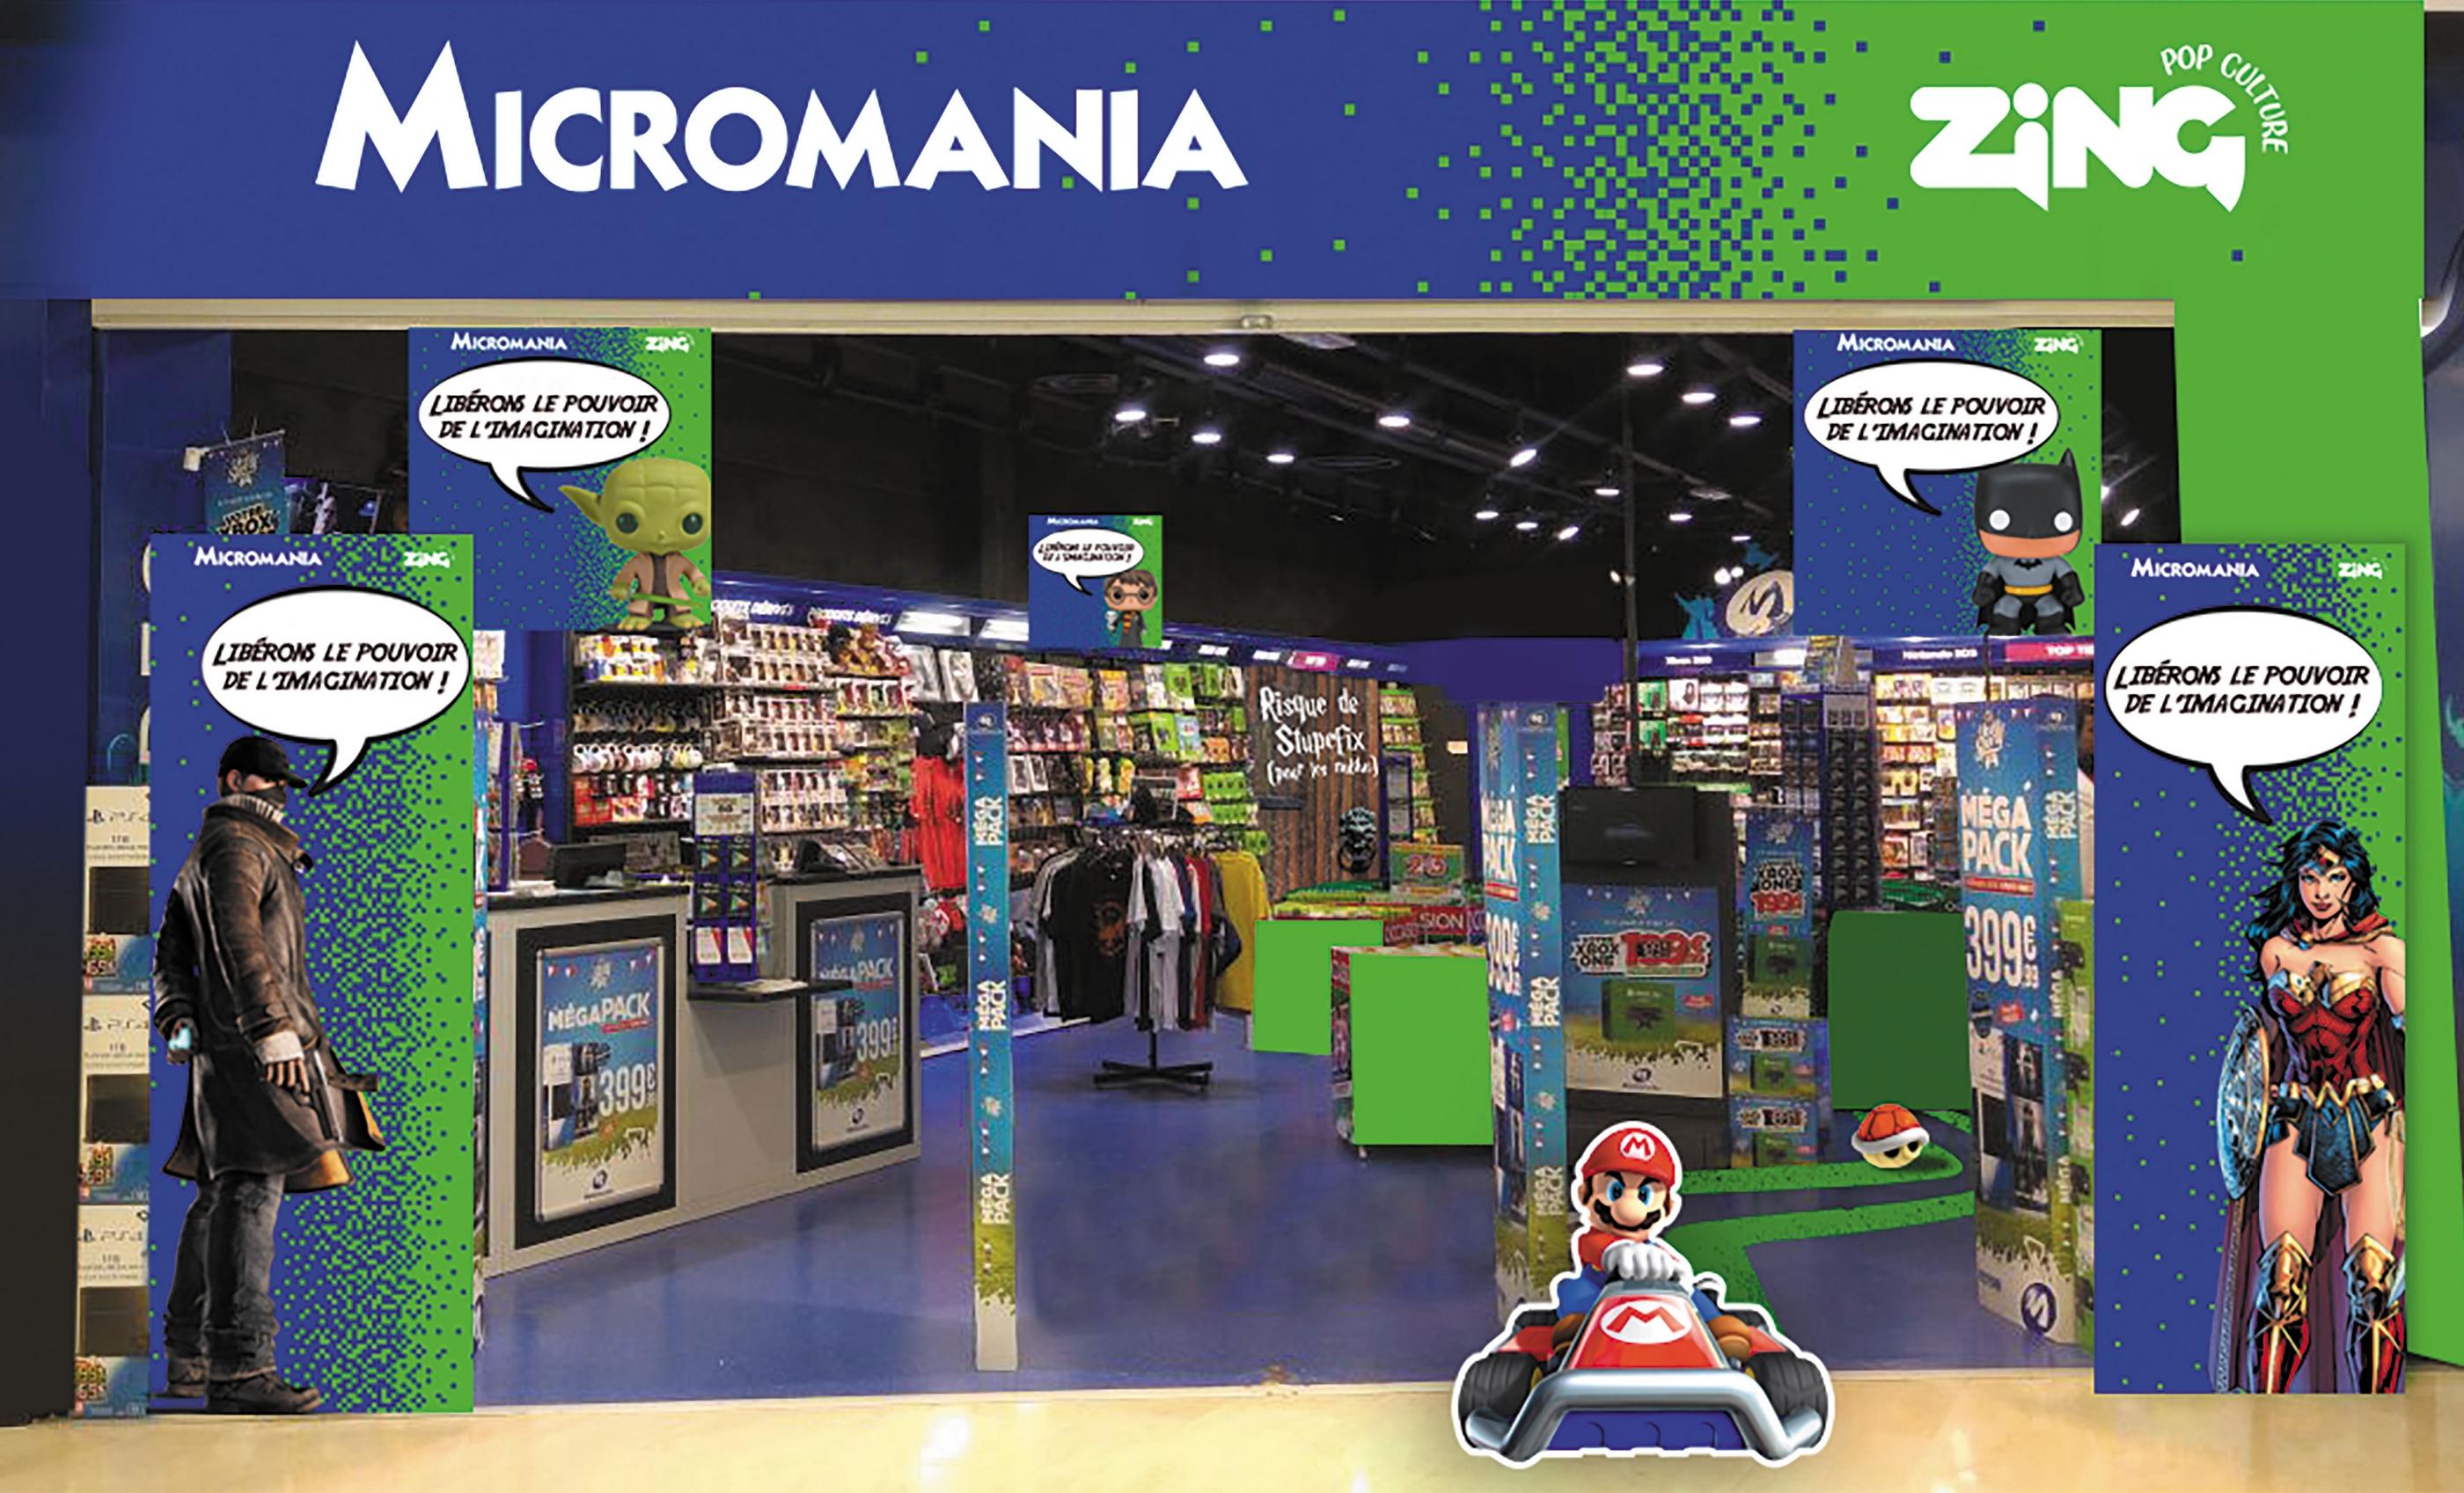 Micromania-Zing : nouvelle façade